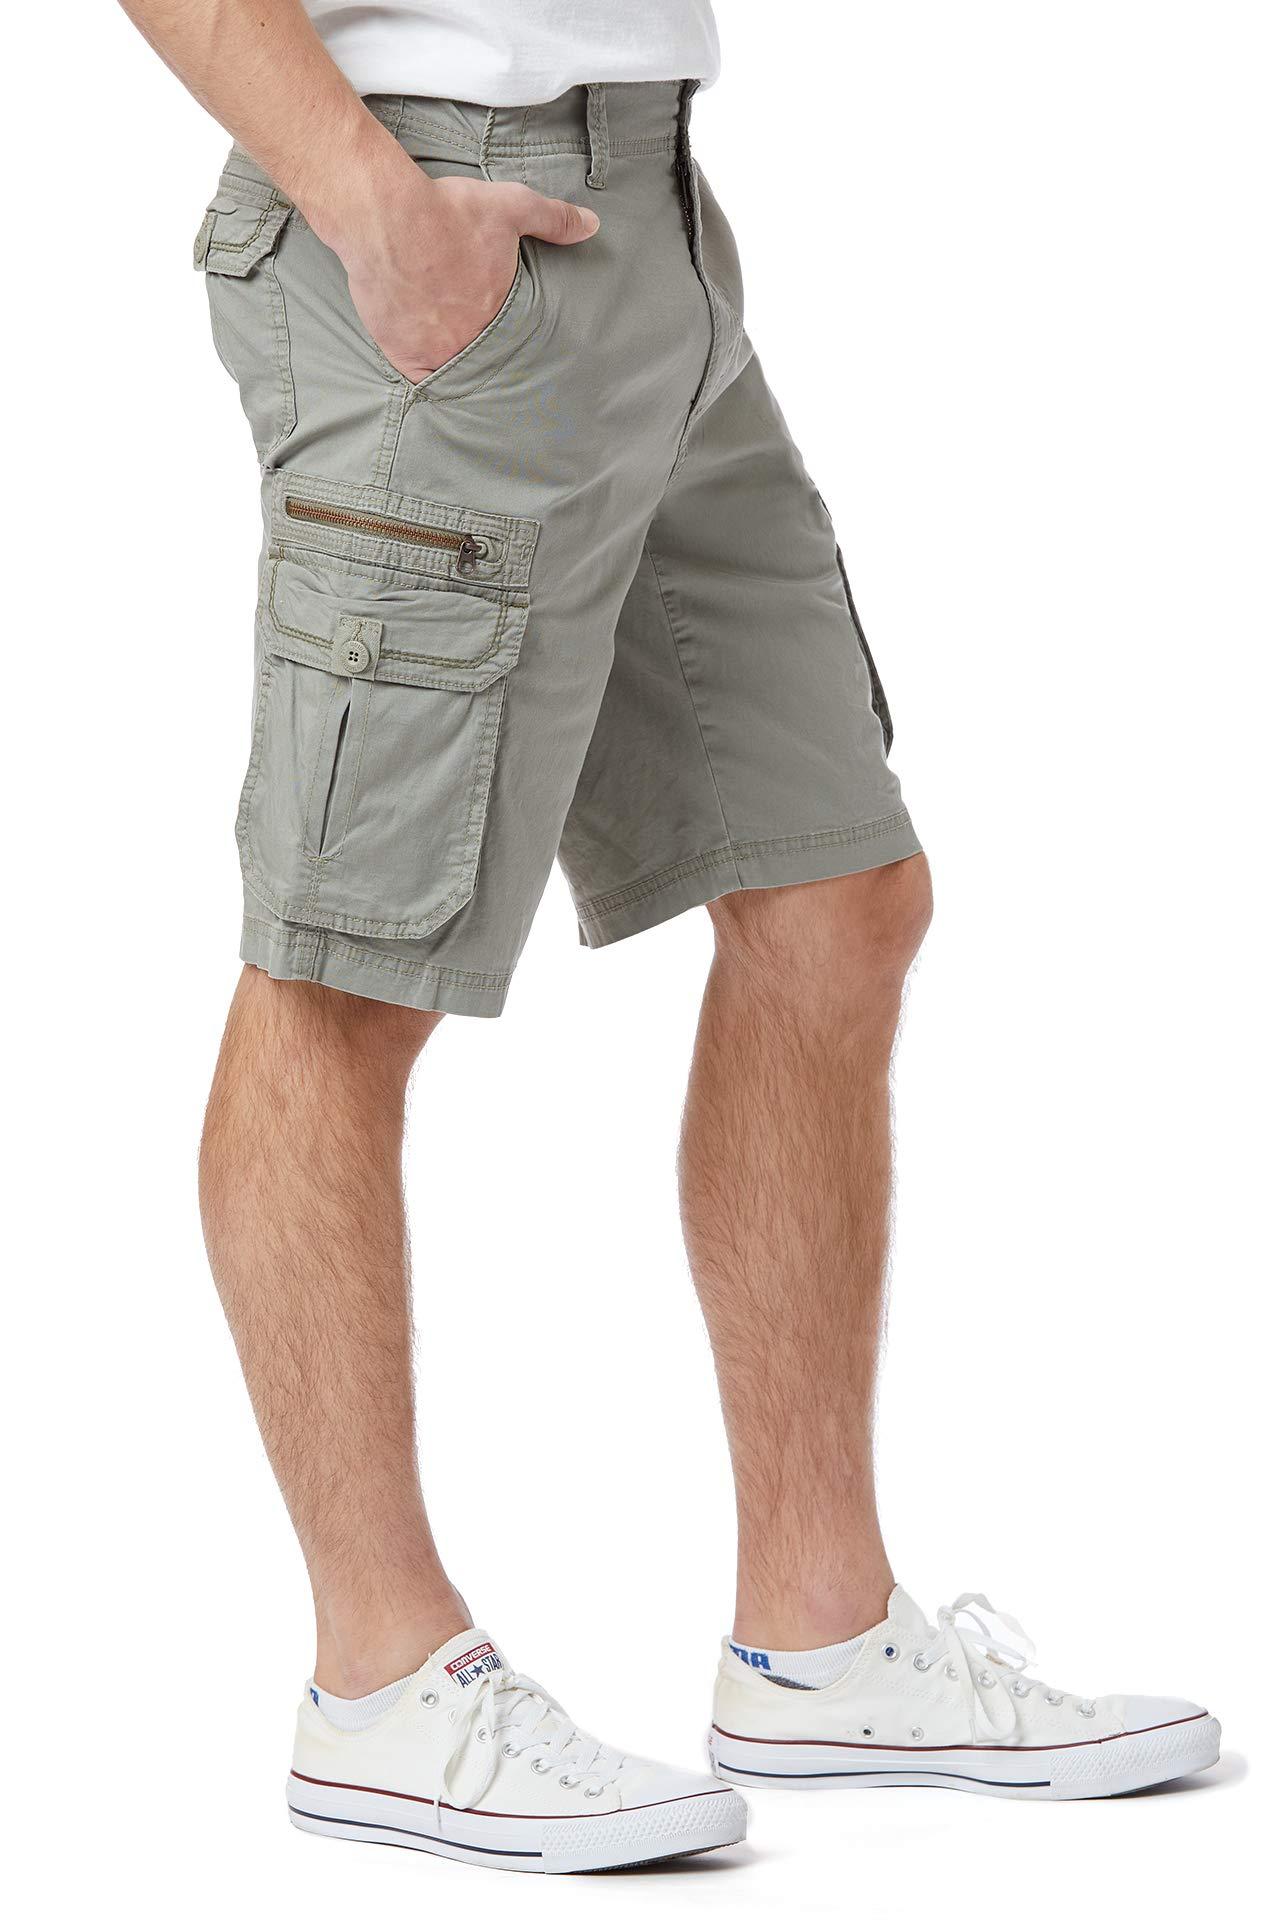 Unionbay para para para Hombre Stretch fresco Sarga Relaxed Fit Zip-elegir talla Color 2eb73e